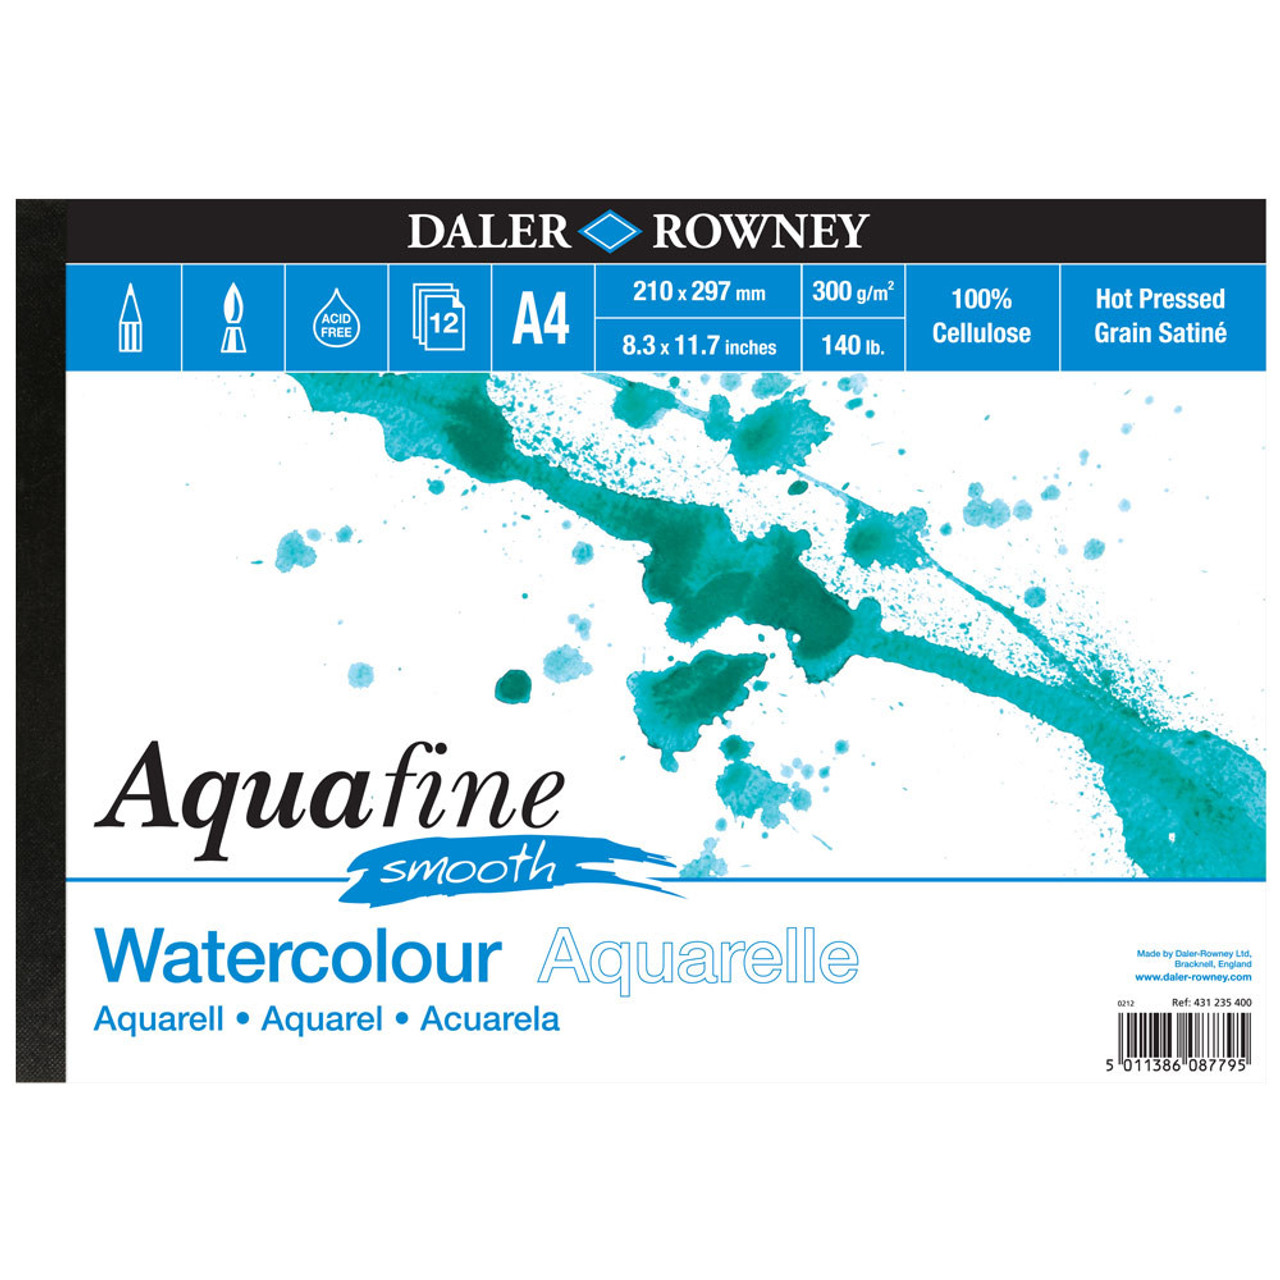 Aquafine Watercolour Paper Hot Pressed